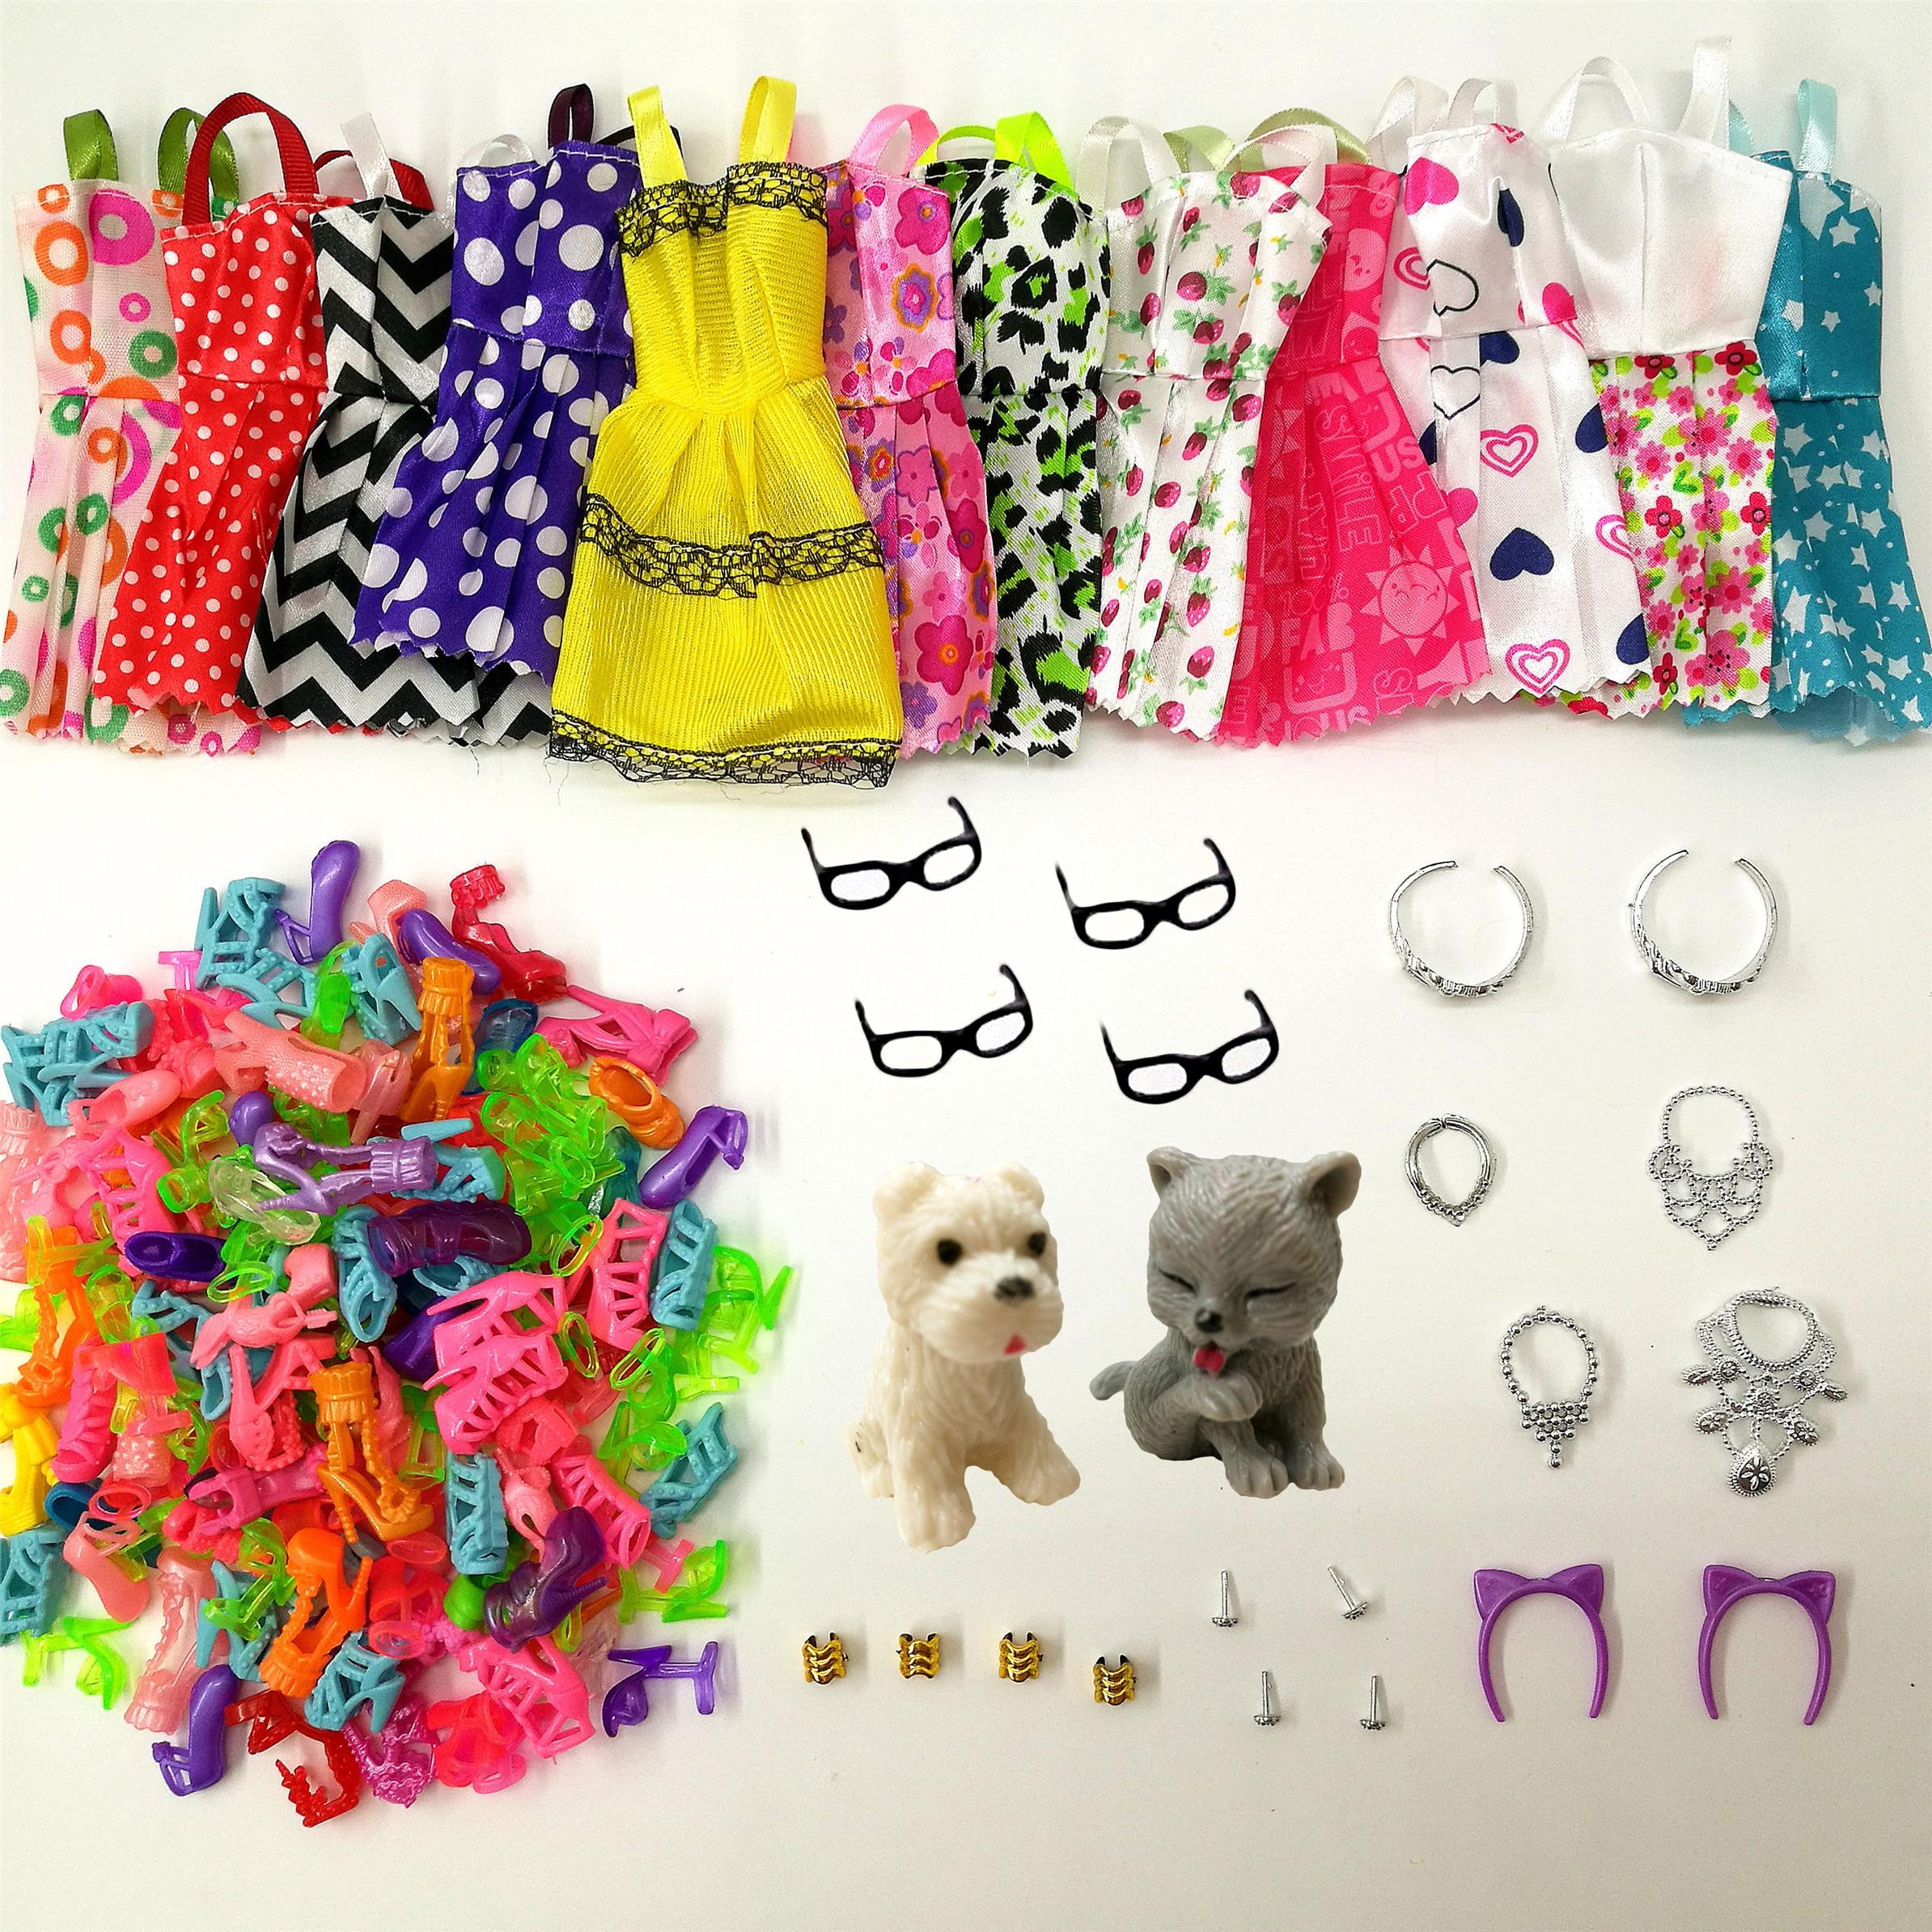 34 Item/Set Doll Accessories = 8pcs Shoes + 4 Necklace 4 Glasses 2 Crowns 2 Doll Pet + 8 Pcs Doll Dress Clothes For Barbie Doll